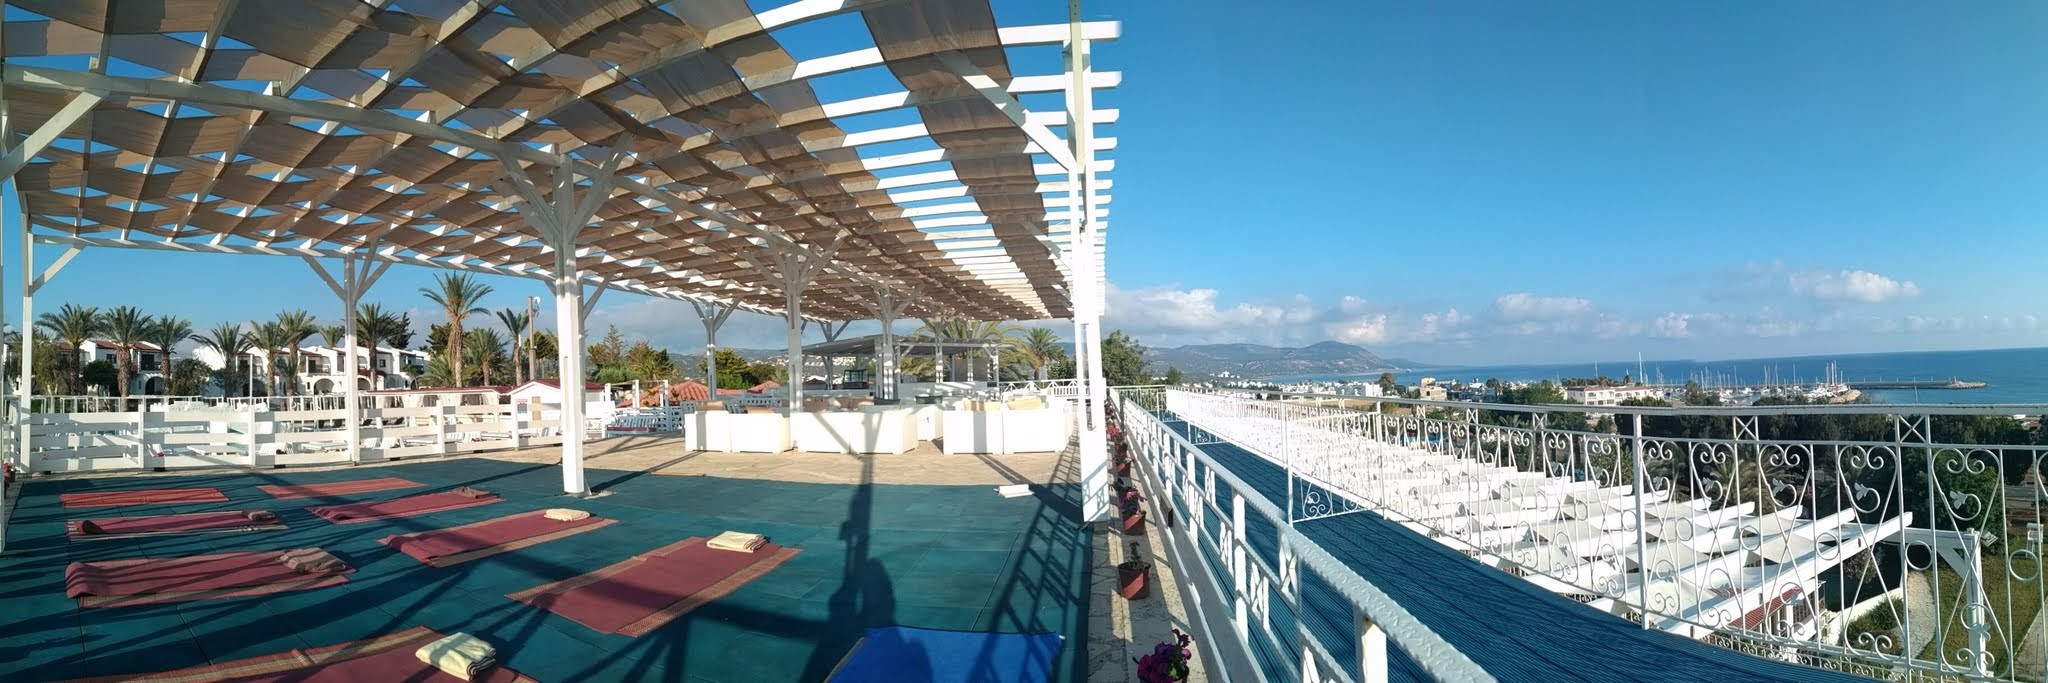 zening resort cyprus hotel ecoresort beach (143)